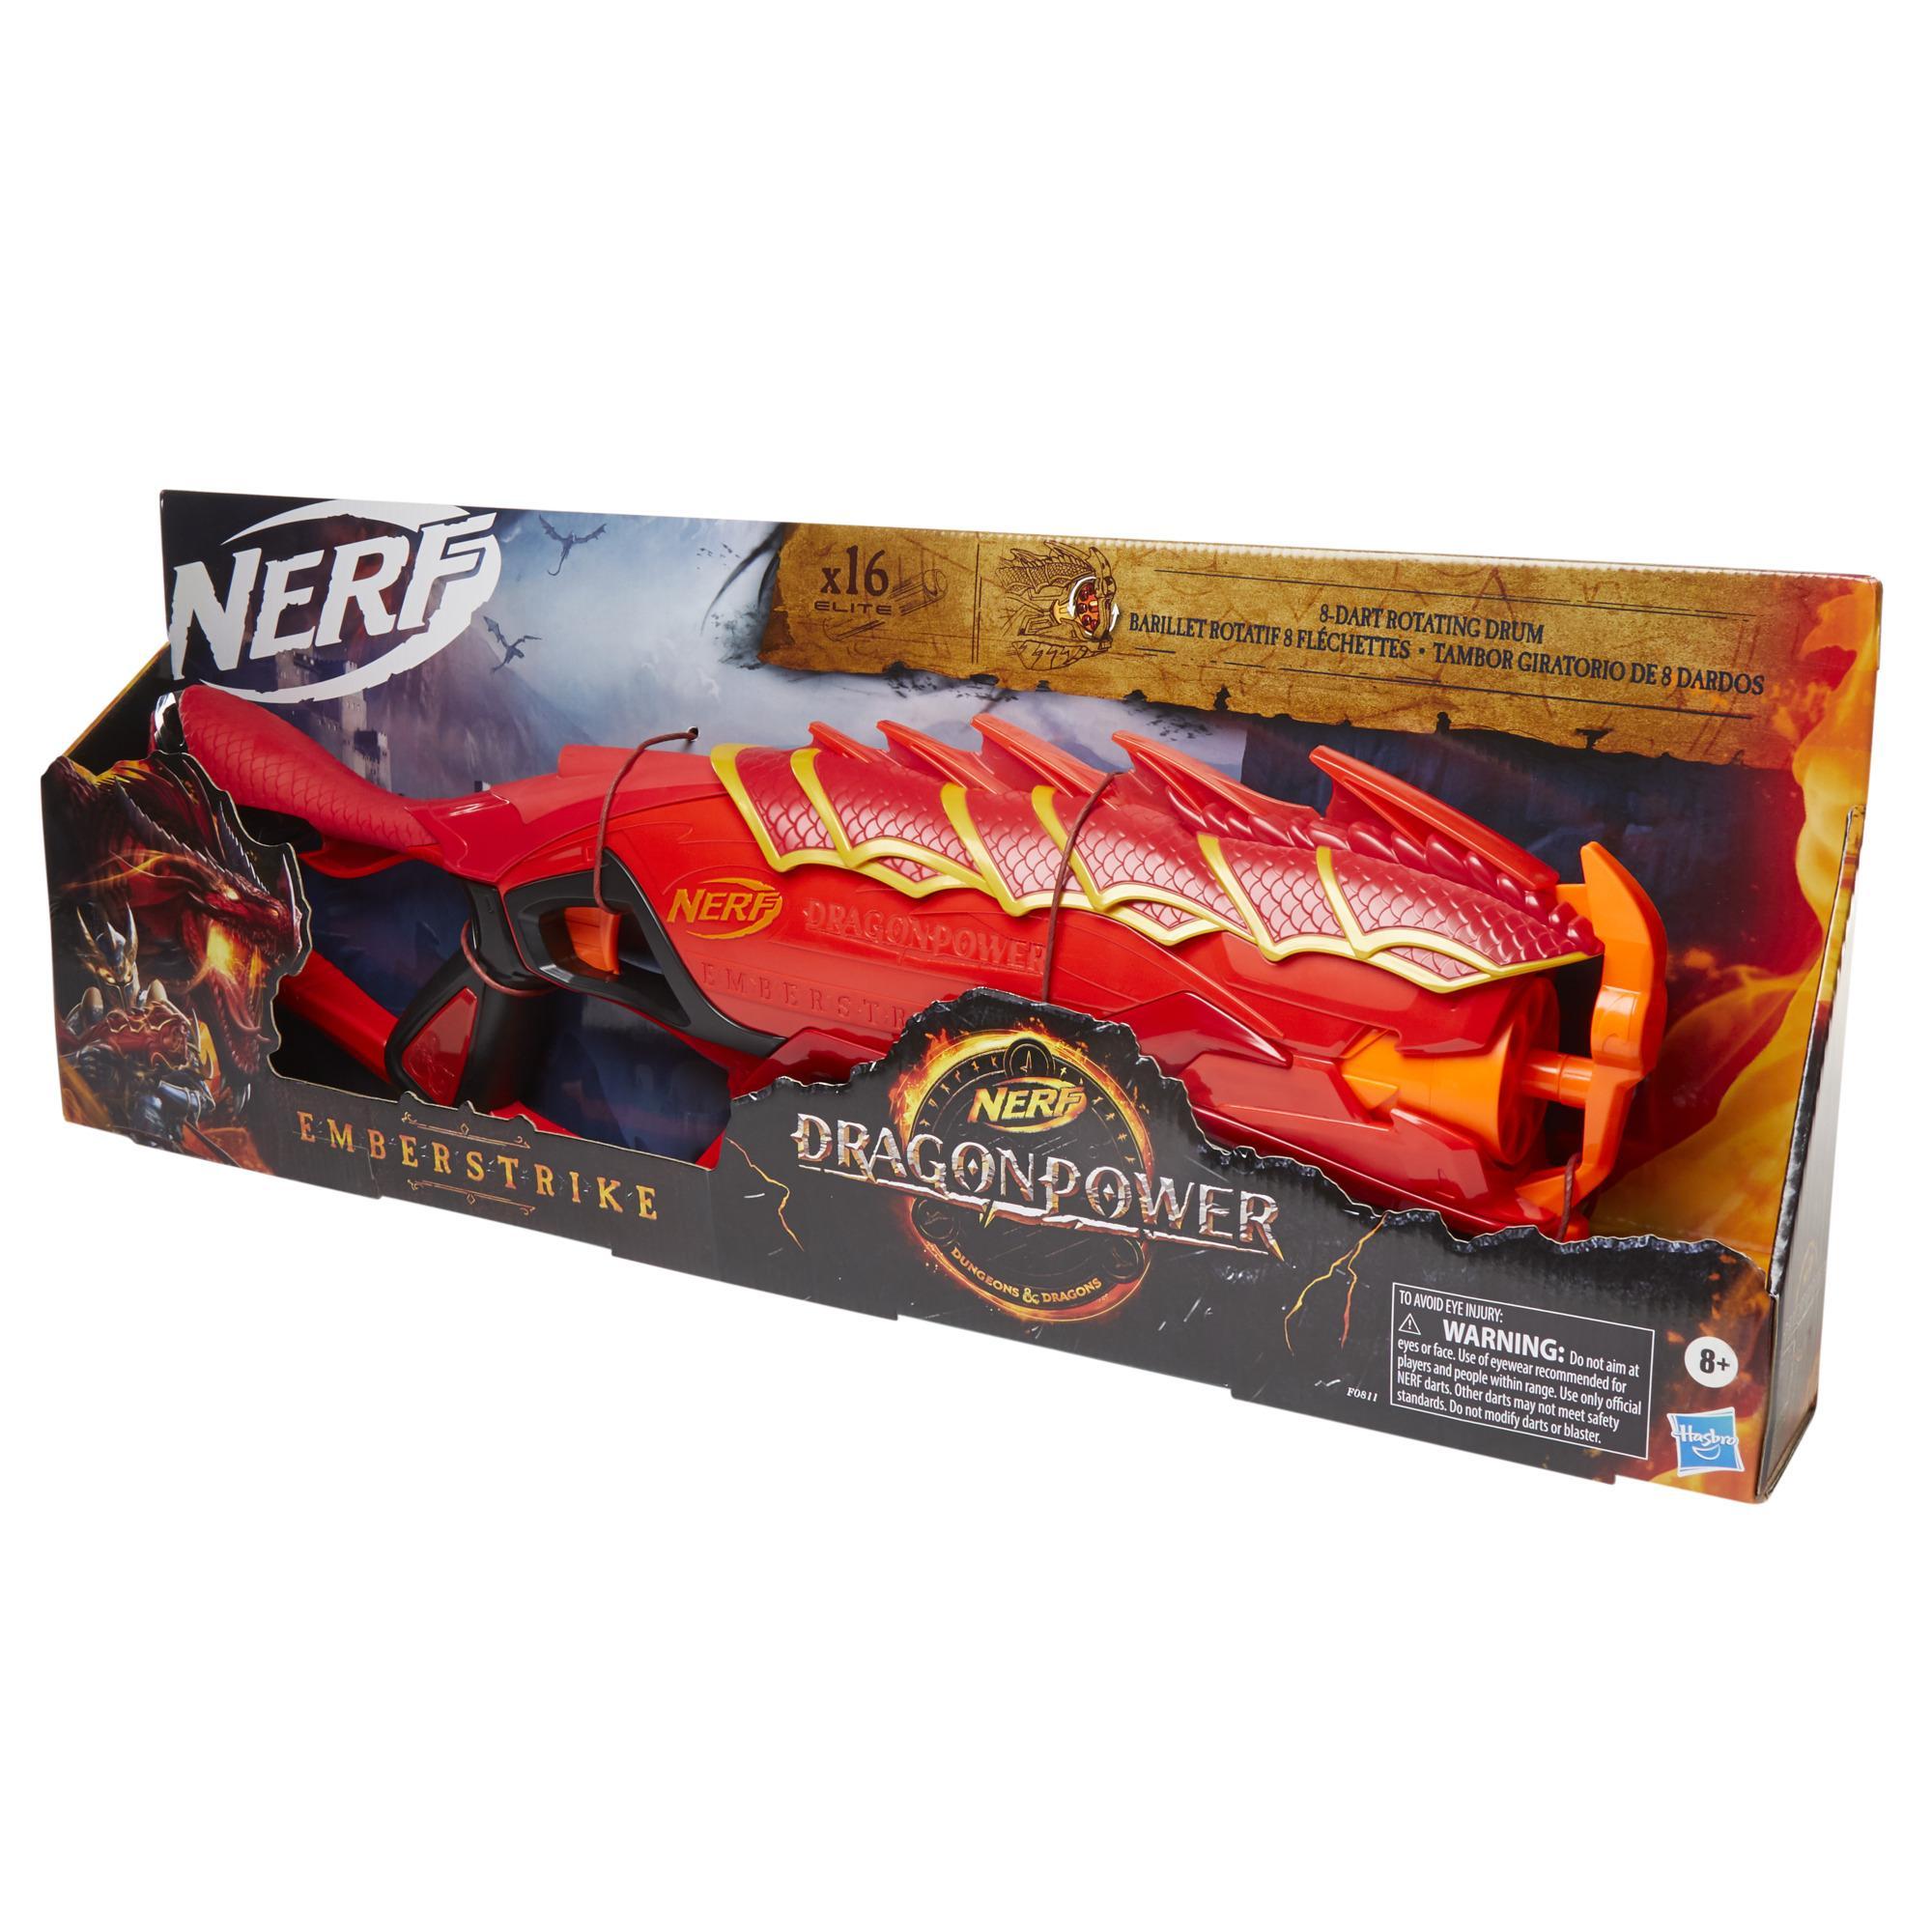 Nerf DragonPower, blaster Emberstrike, inspiré de Dungeon and Dragons, barillet 8 fléchettes, 16 fléchettes Nerf